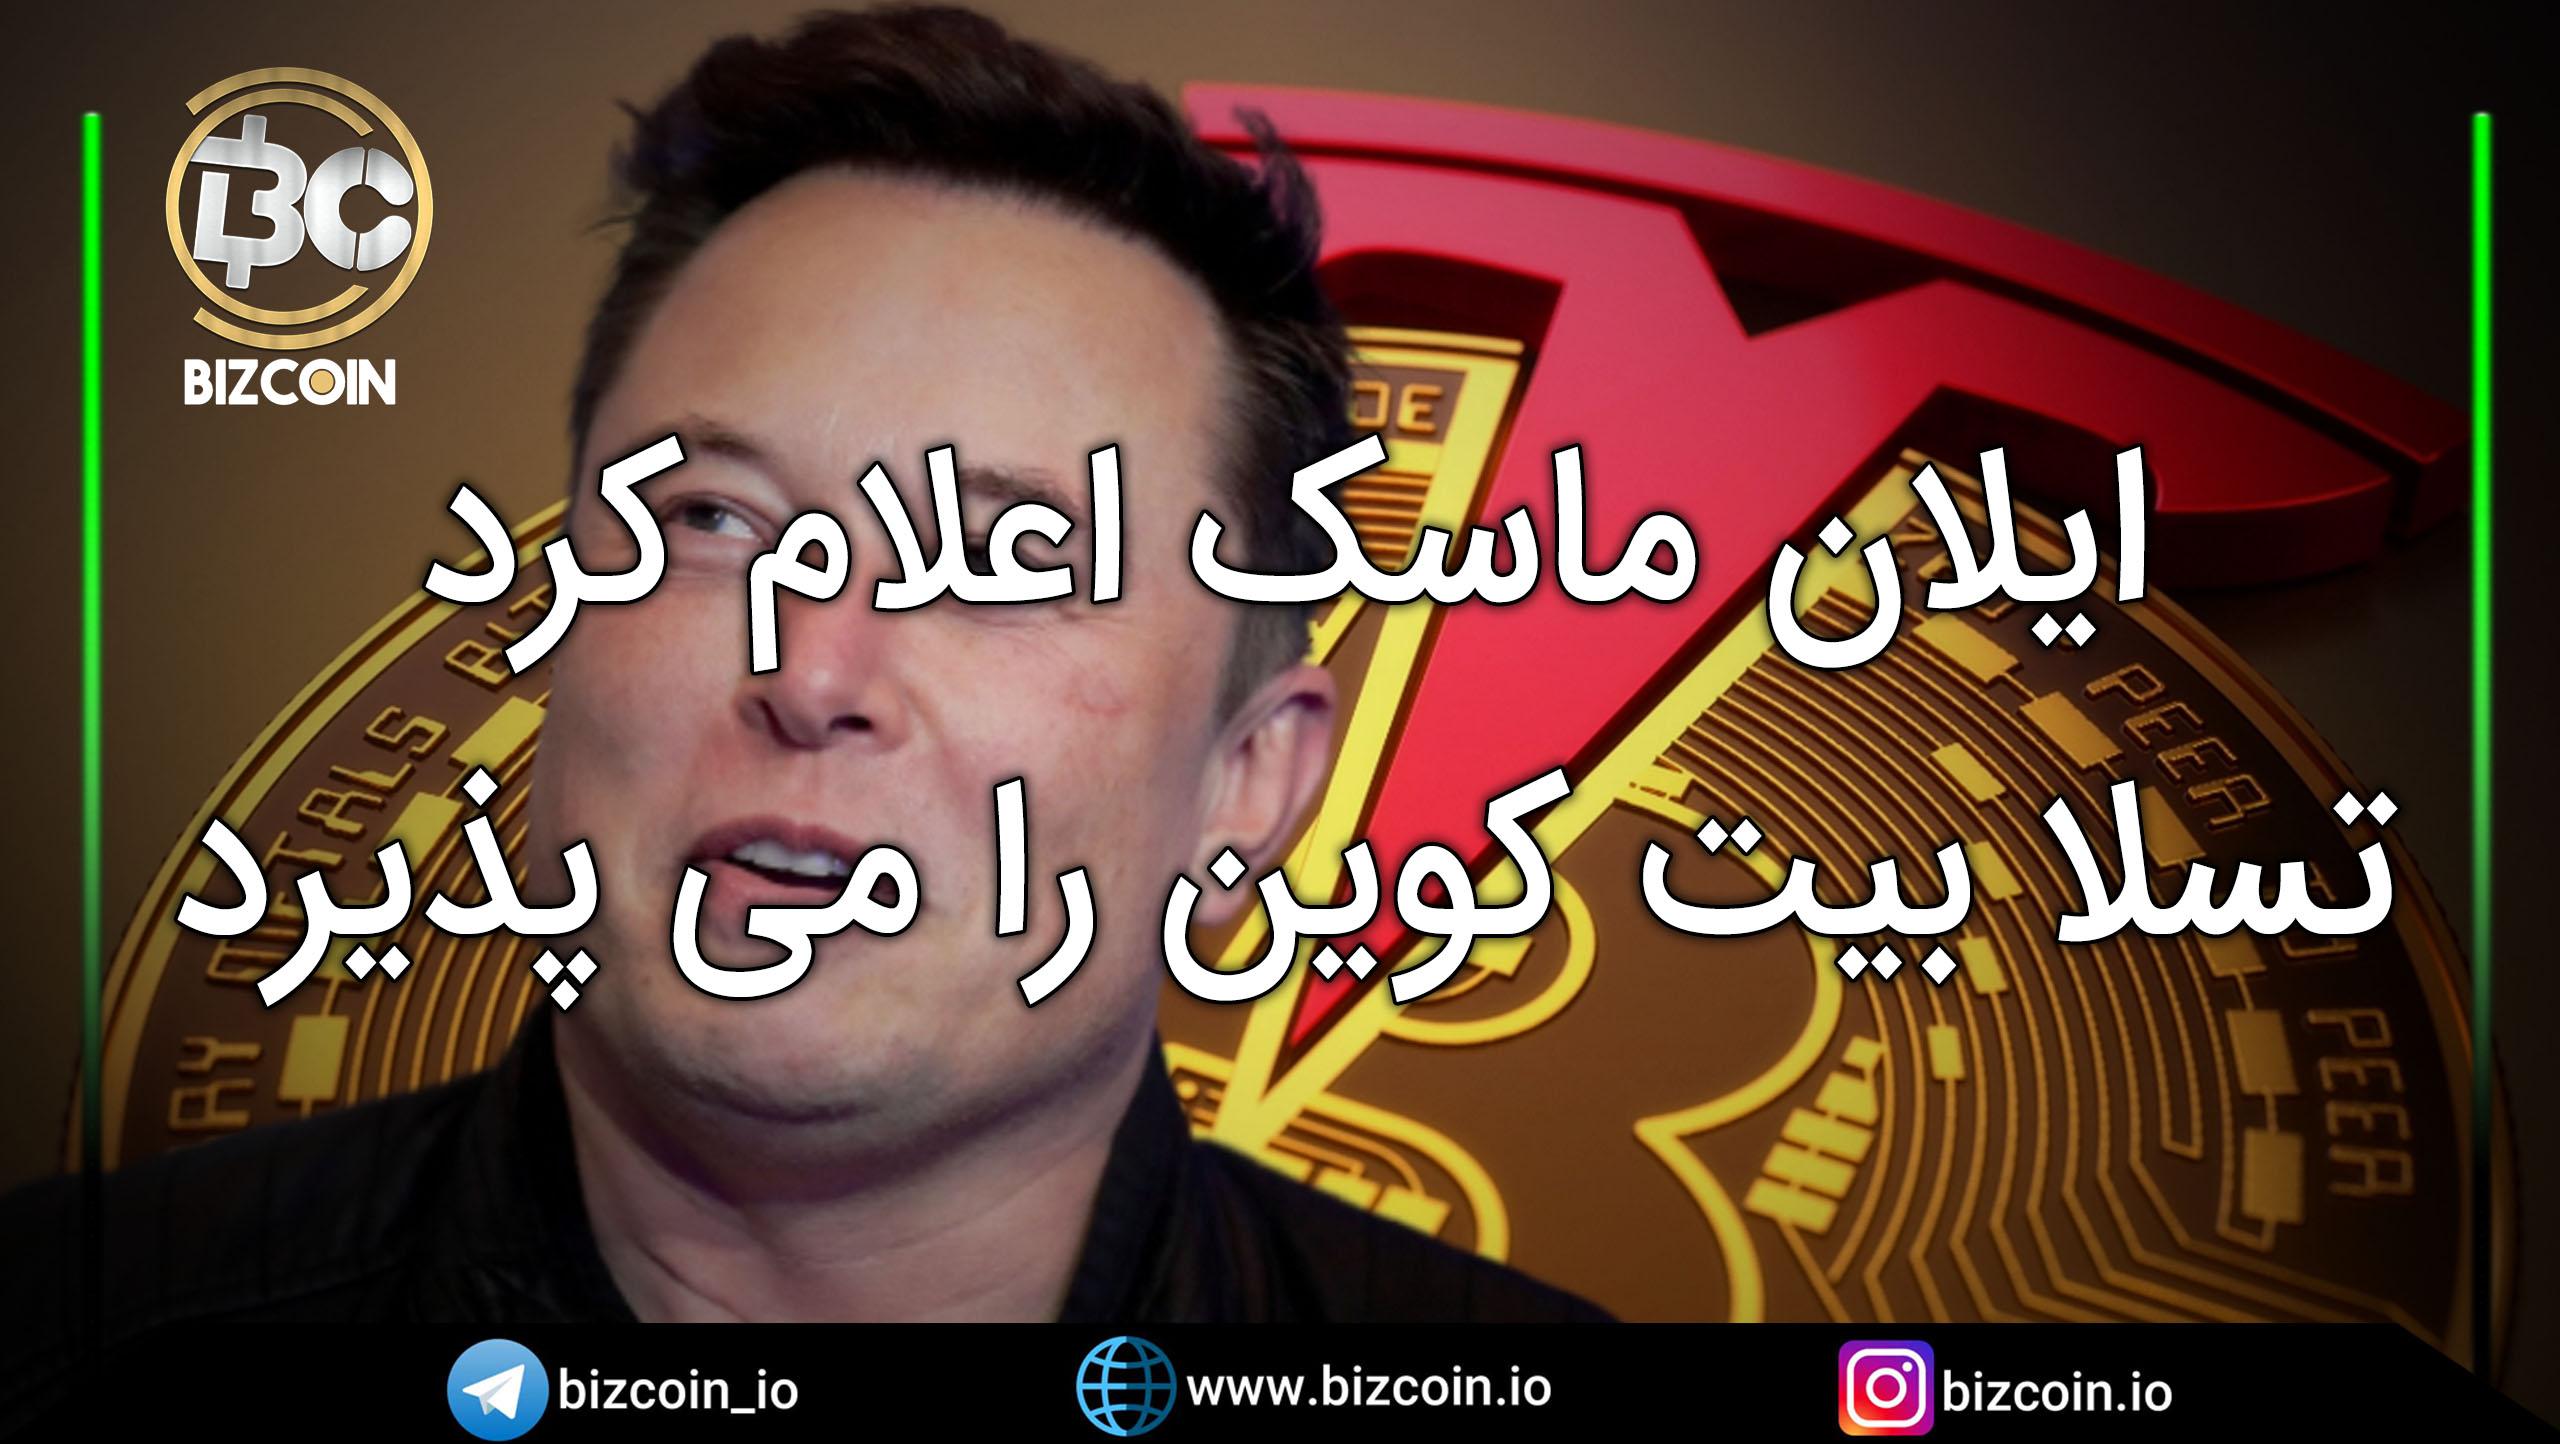 Elon Musk announced that she accepts Tesla Bitcoin ایلان ماسک اعلام کرد تسلا بیت کوین را می پذیرد